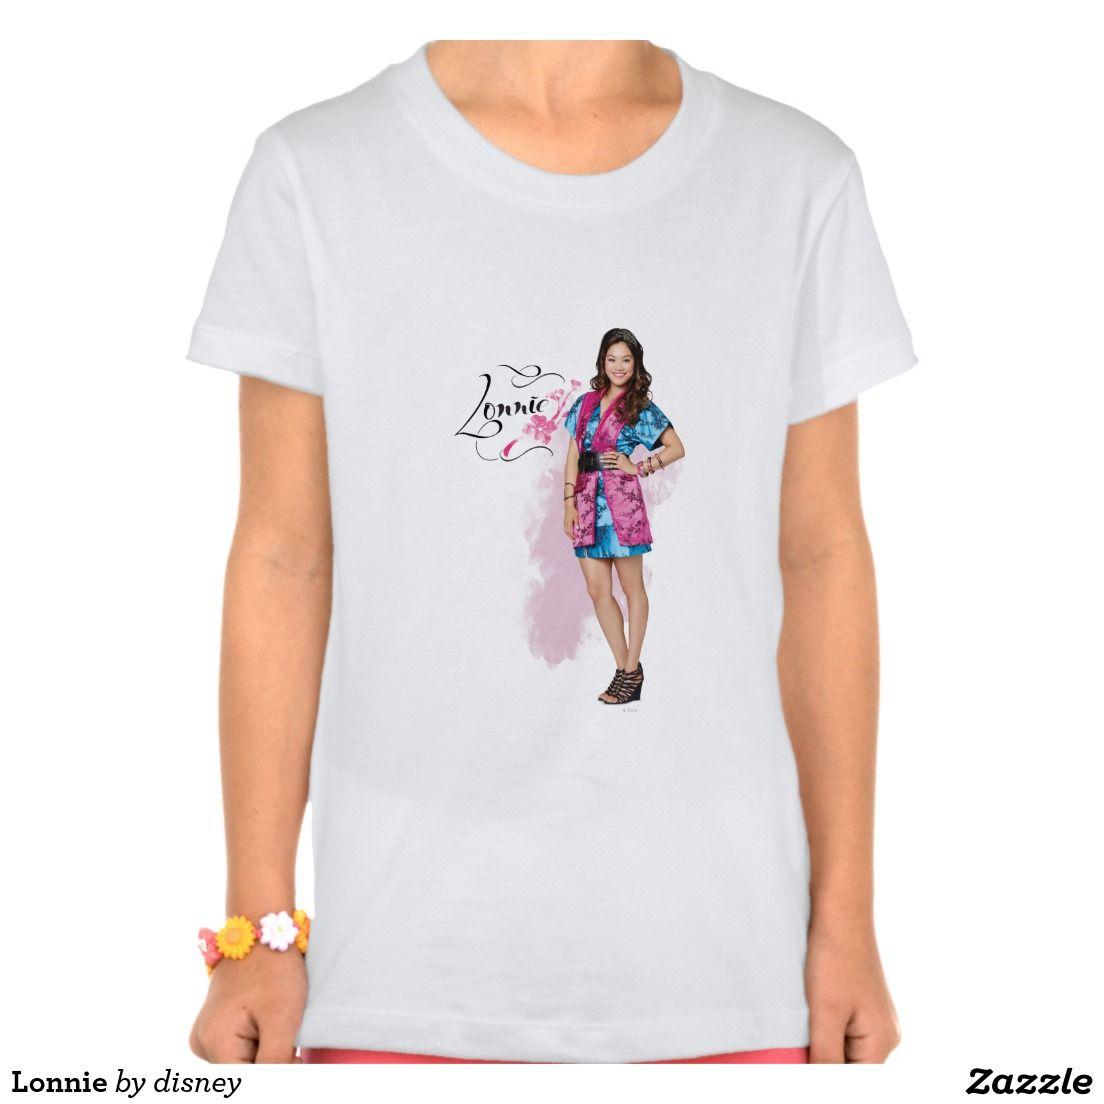 Zazzle t shirt design size - Roblox Logo Girl Zazzle T Shirt Discount Code Pinterest Raglan Shirts Logos And Sweatshirt